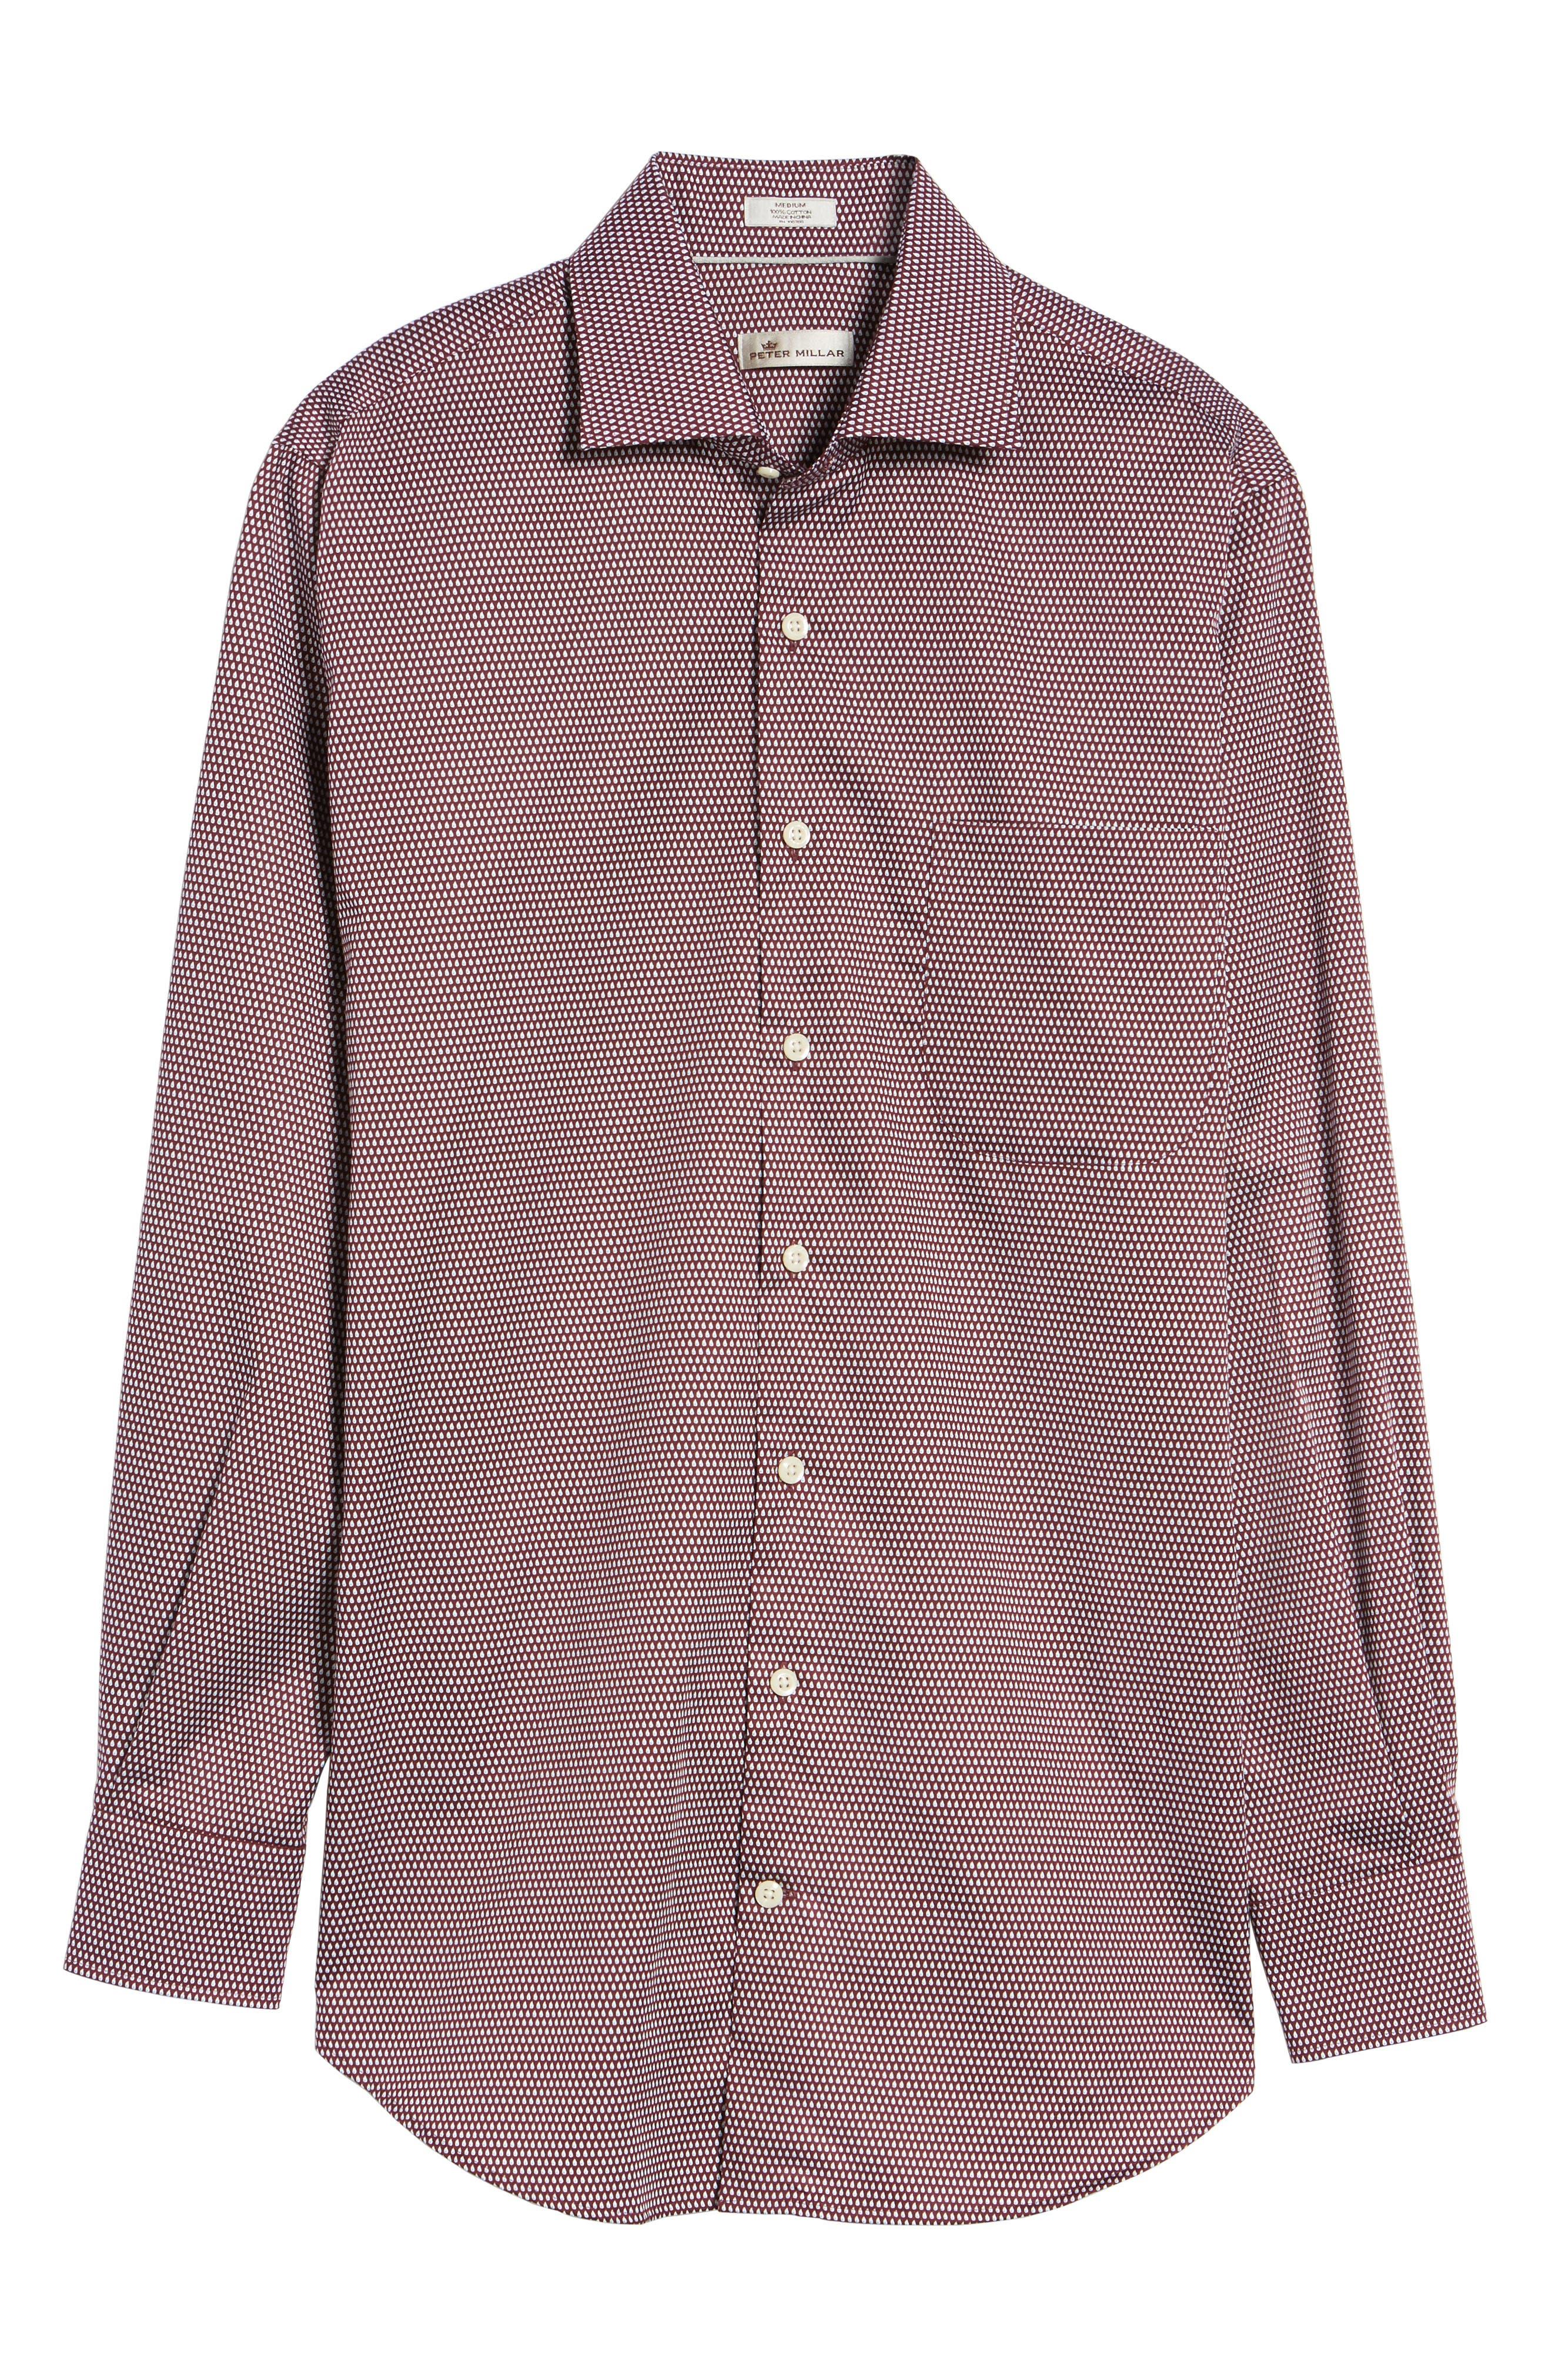 Single Flame Regular Fit Sport Shirt,                             Alternate thumbnail 6, color,                             930